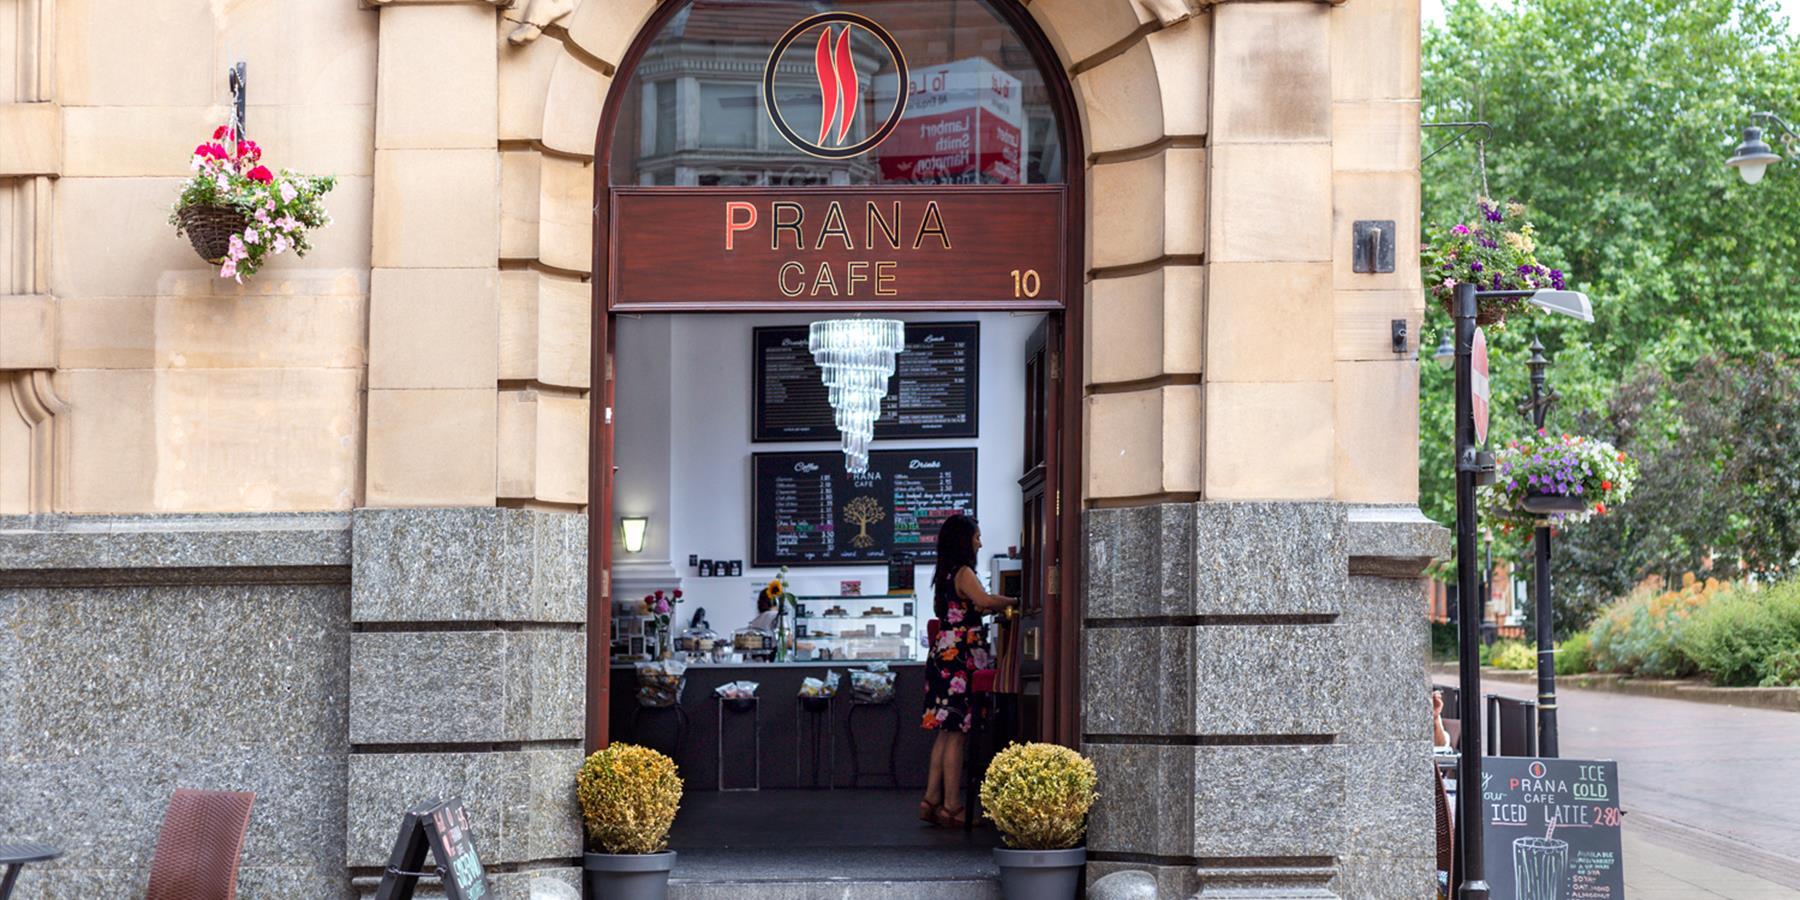 Prana Cafe